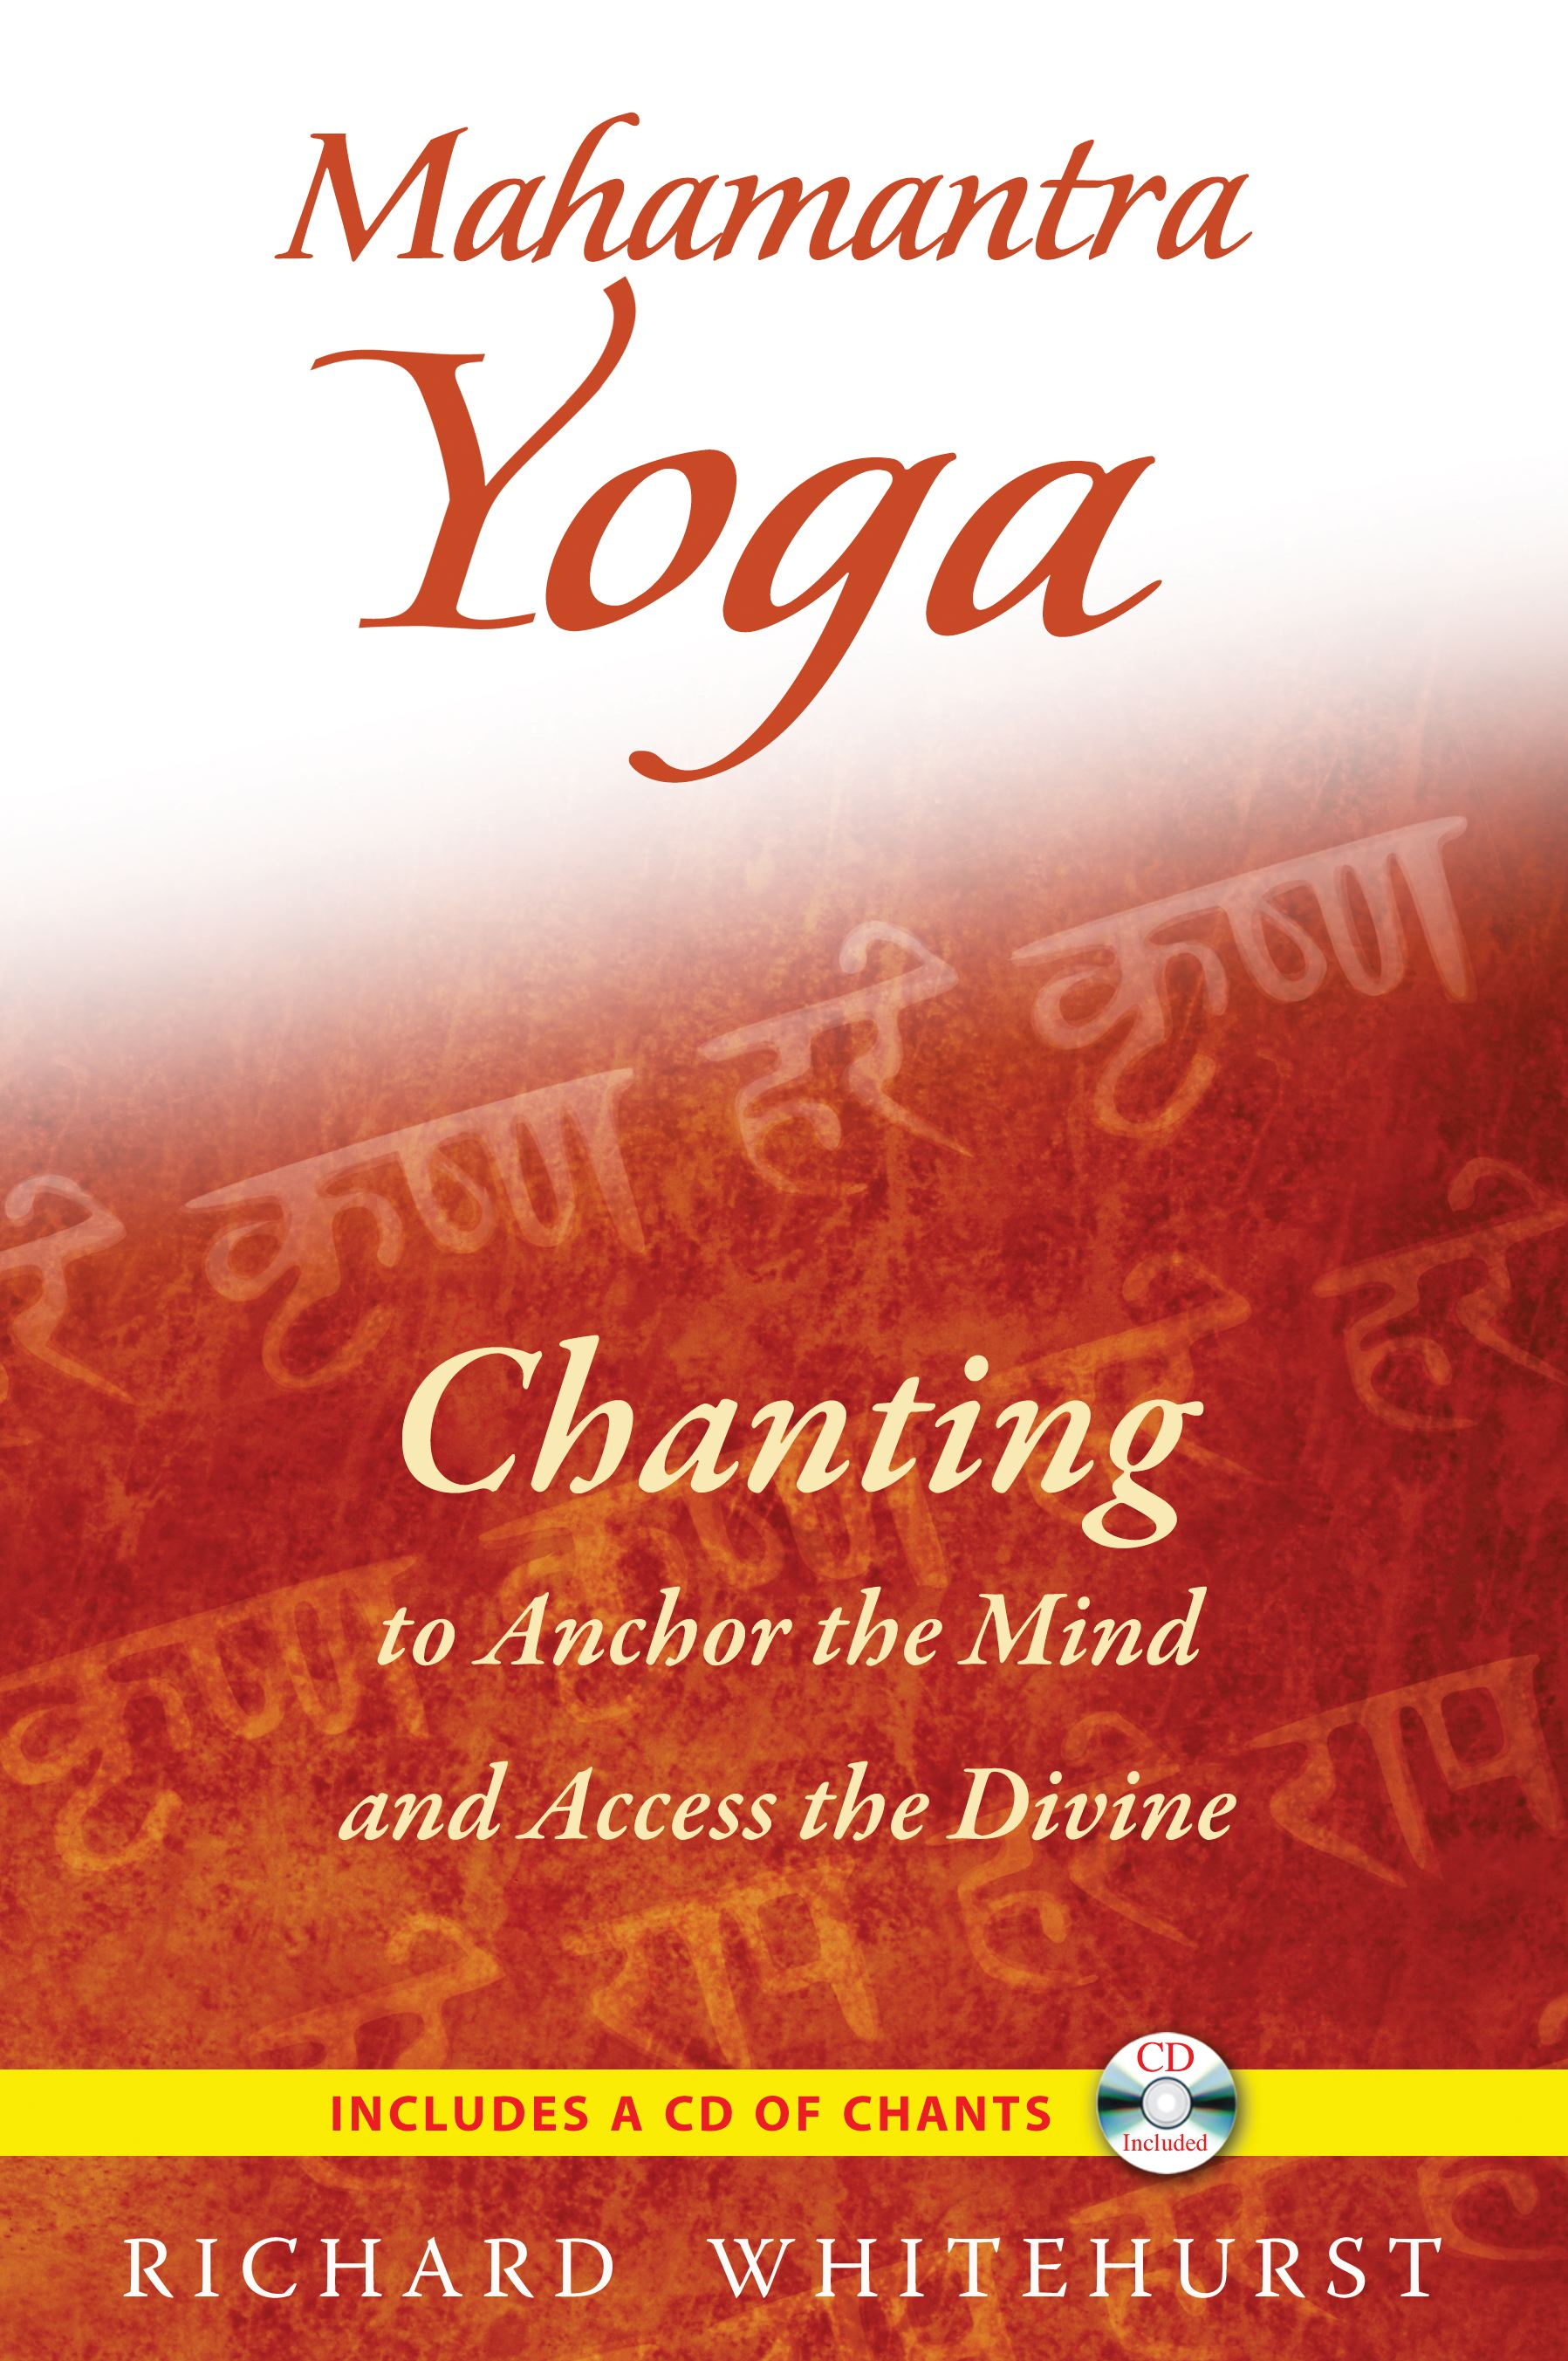 Mahamantra yoga 9781594773716 hr